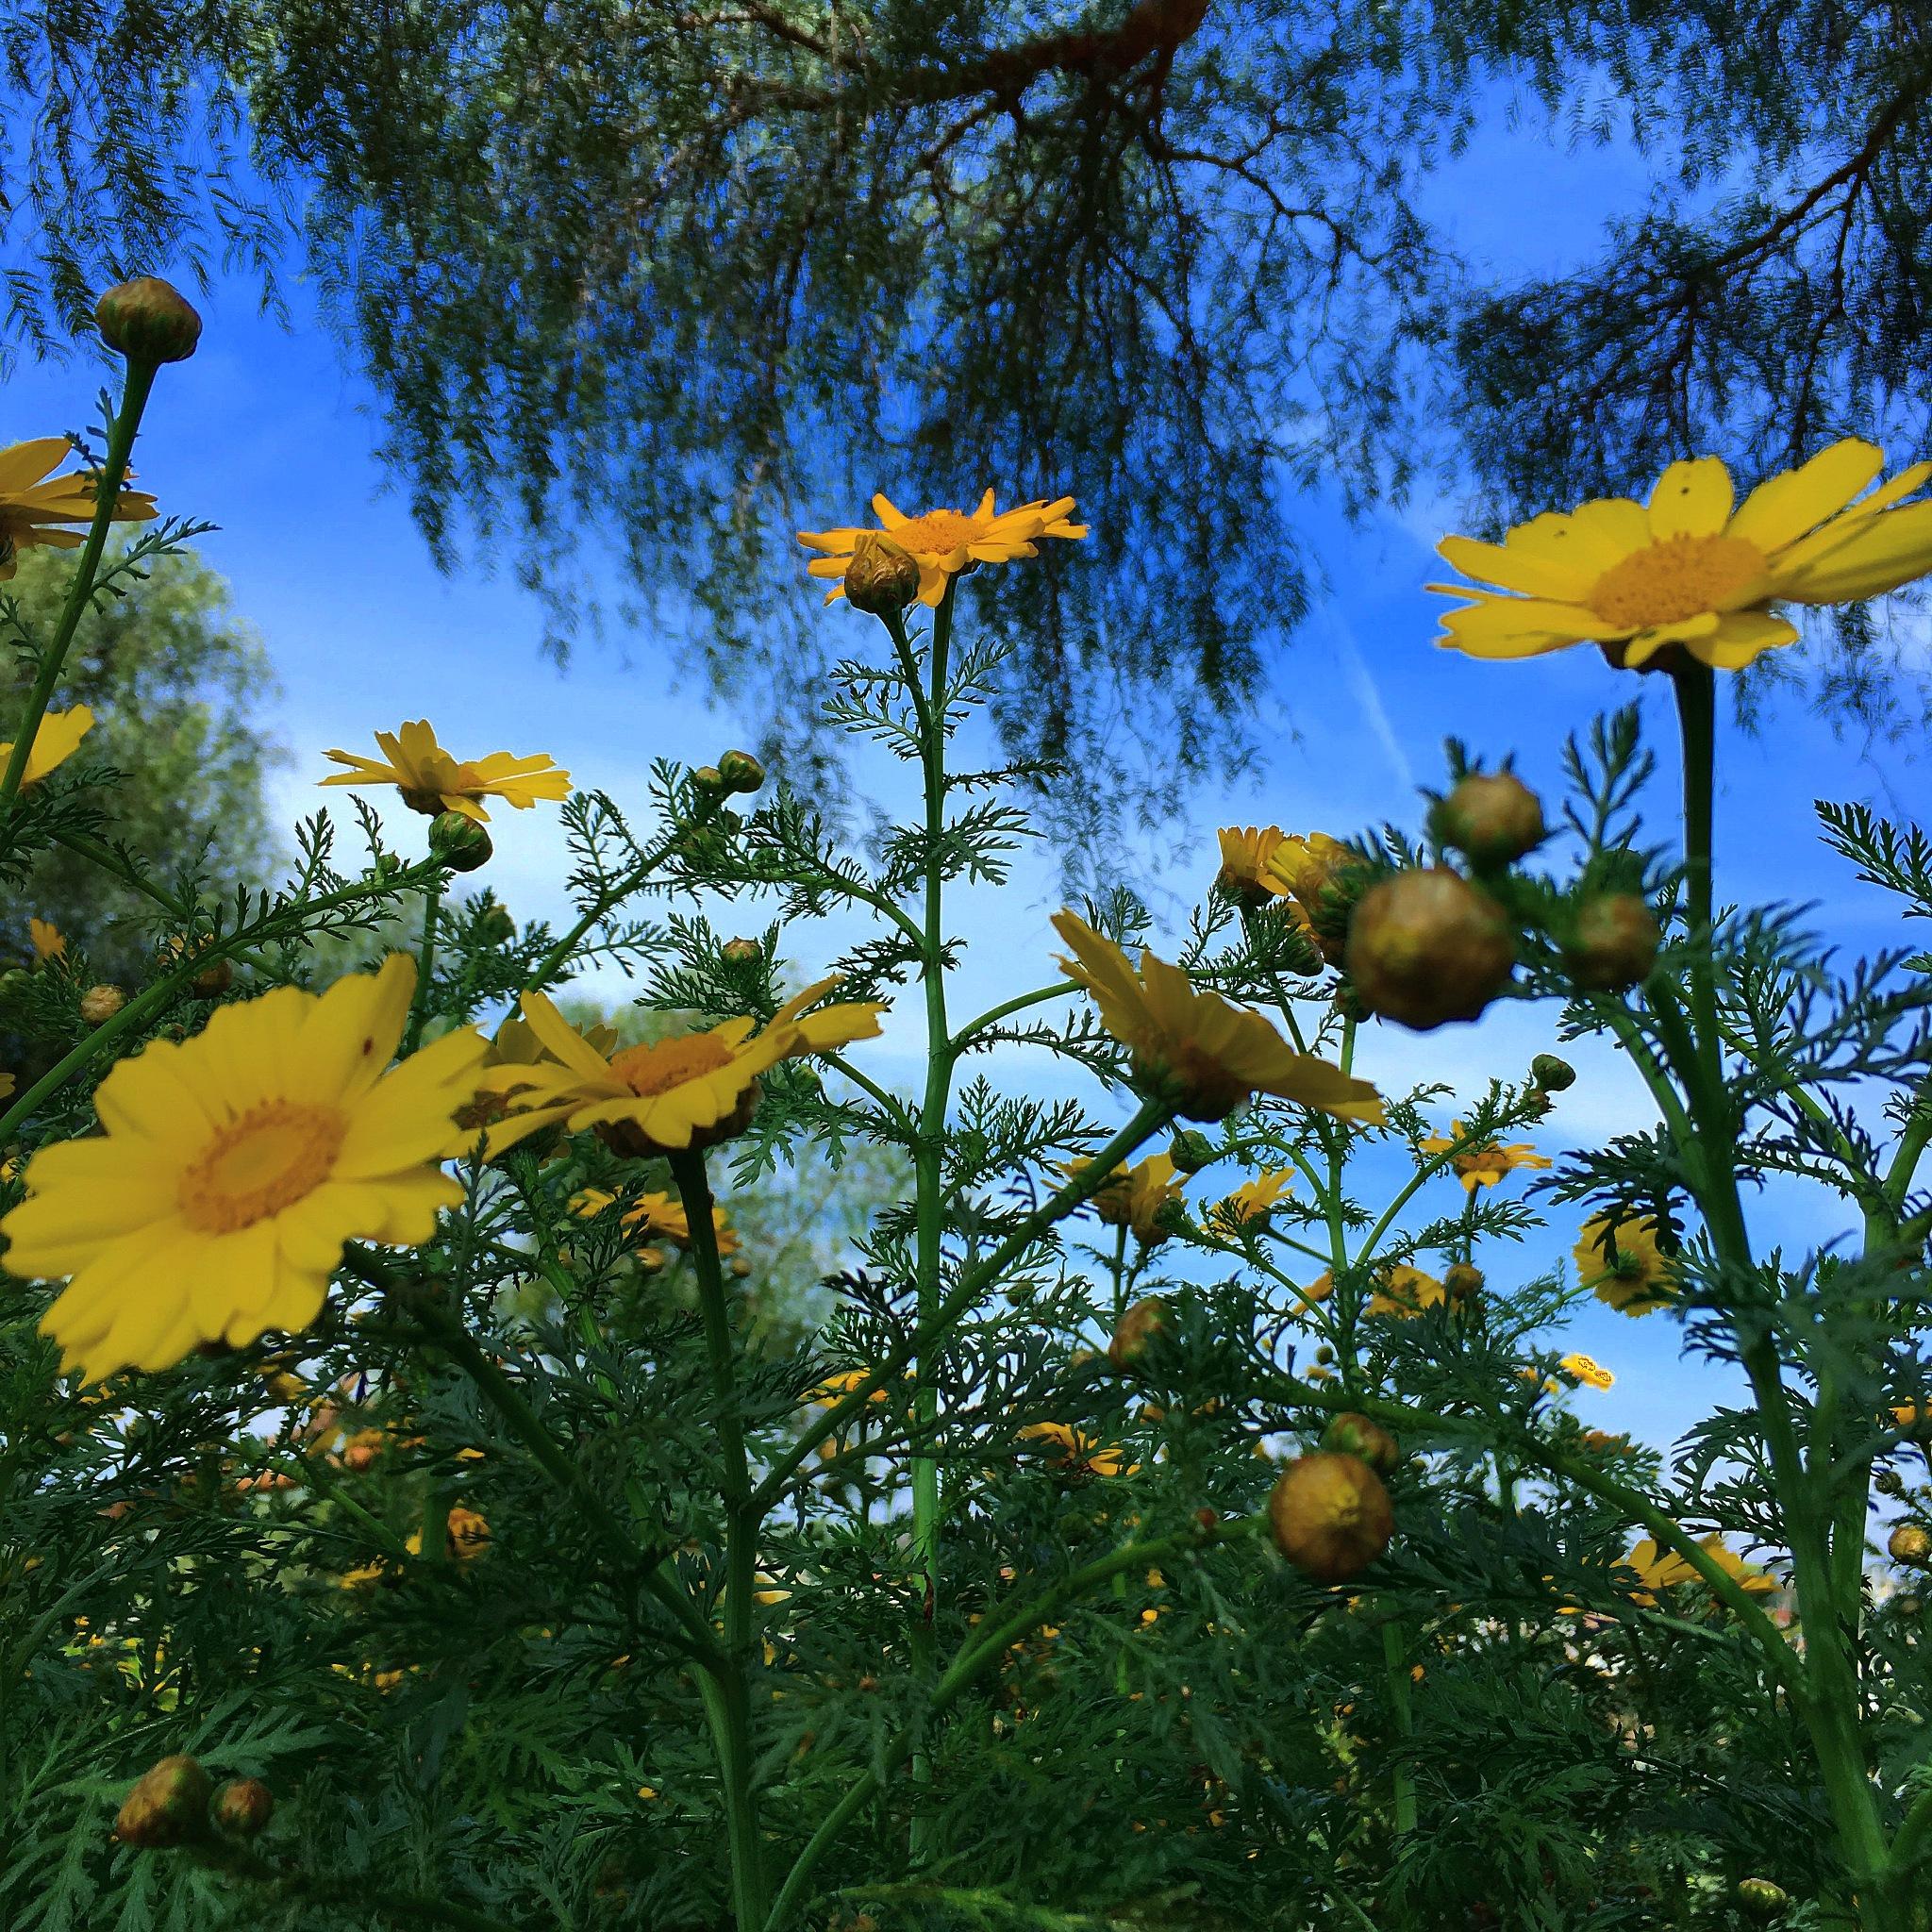 Sunflowers  by wordamouPH